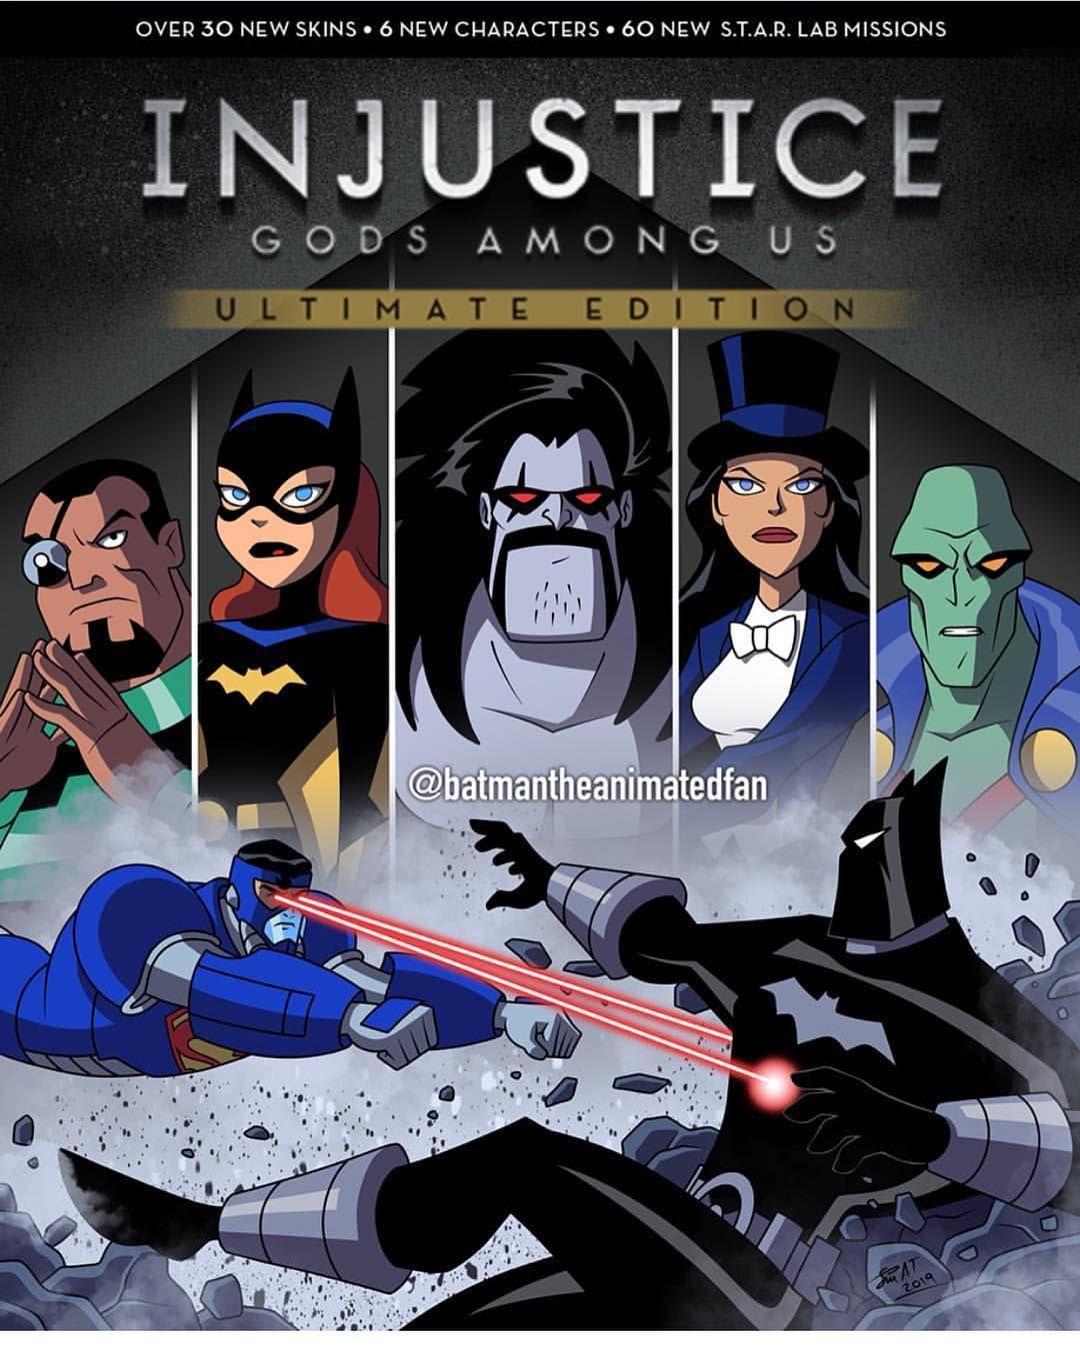 The Batman On Instagram Animated Injustice By Batmantheanimatedfan Injusticegodsamongus Batmanvsuperman Batman Superman Batgirl Wonderwoman Aq